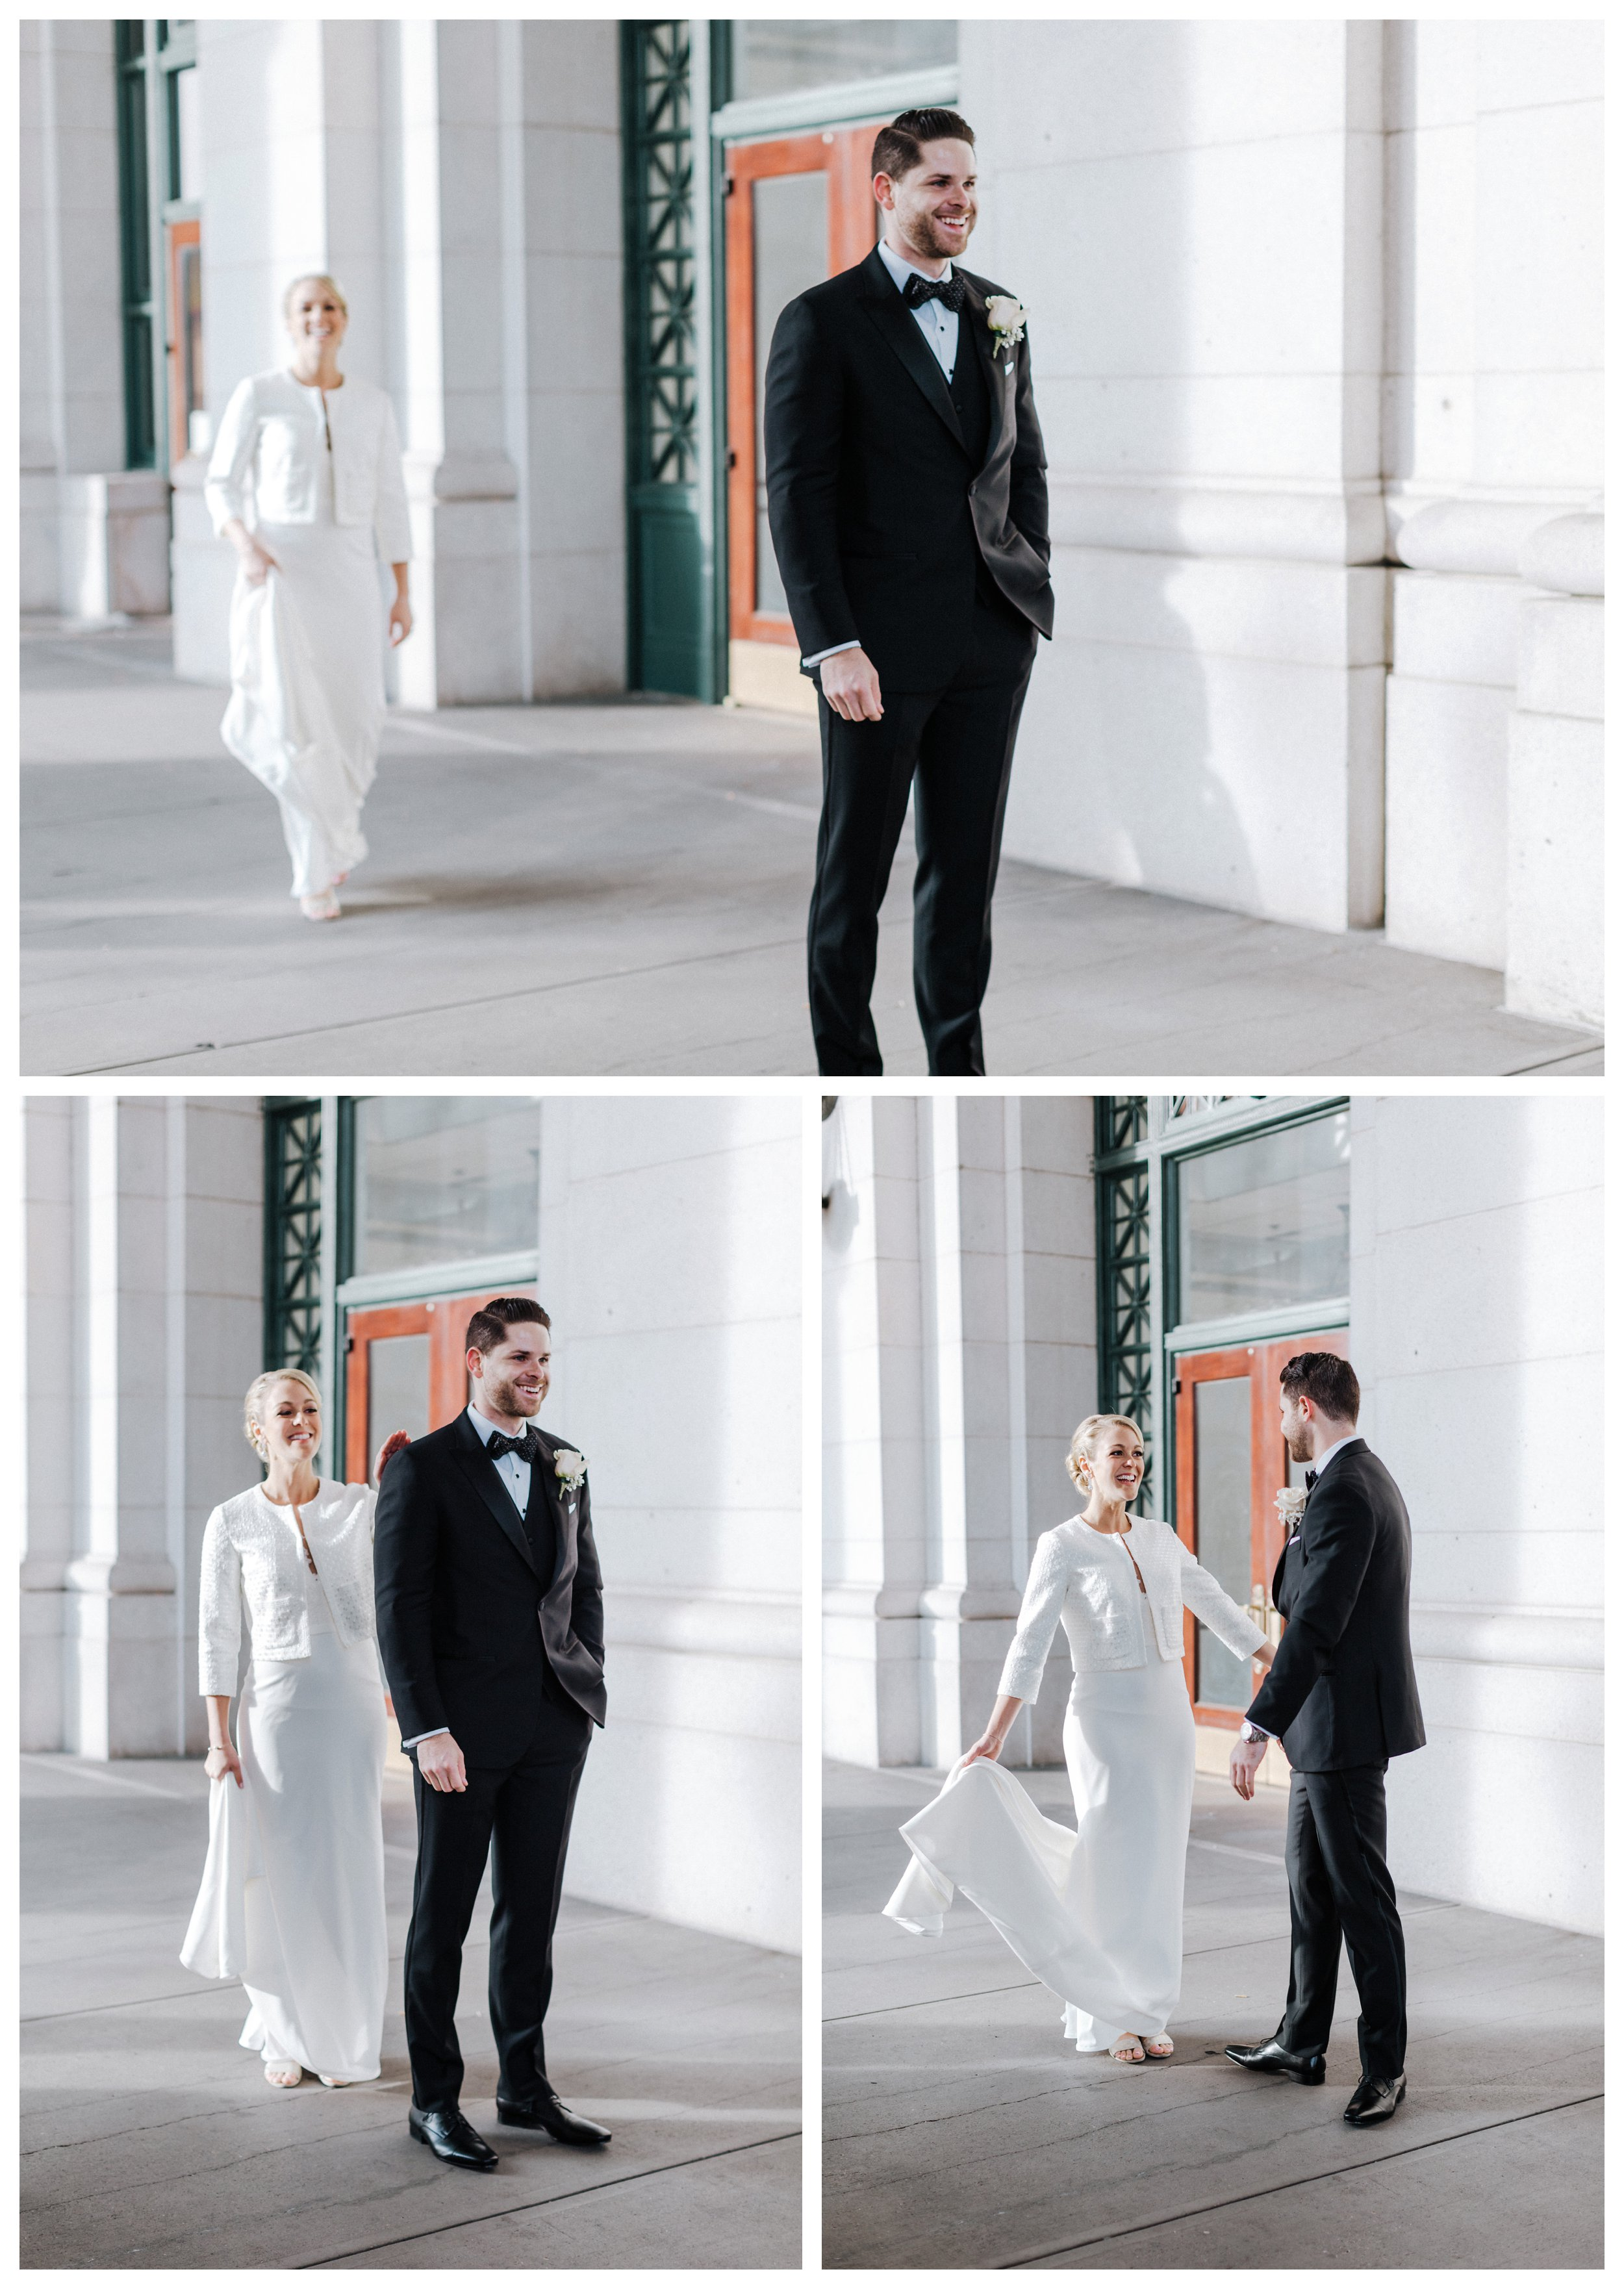 washington-dc-wedding-photographer-9.JPG